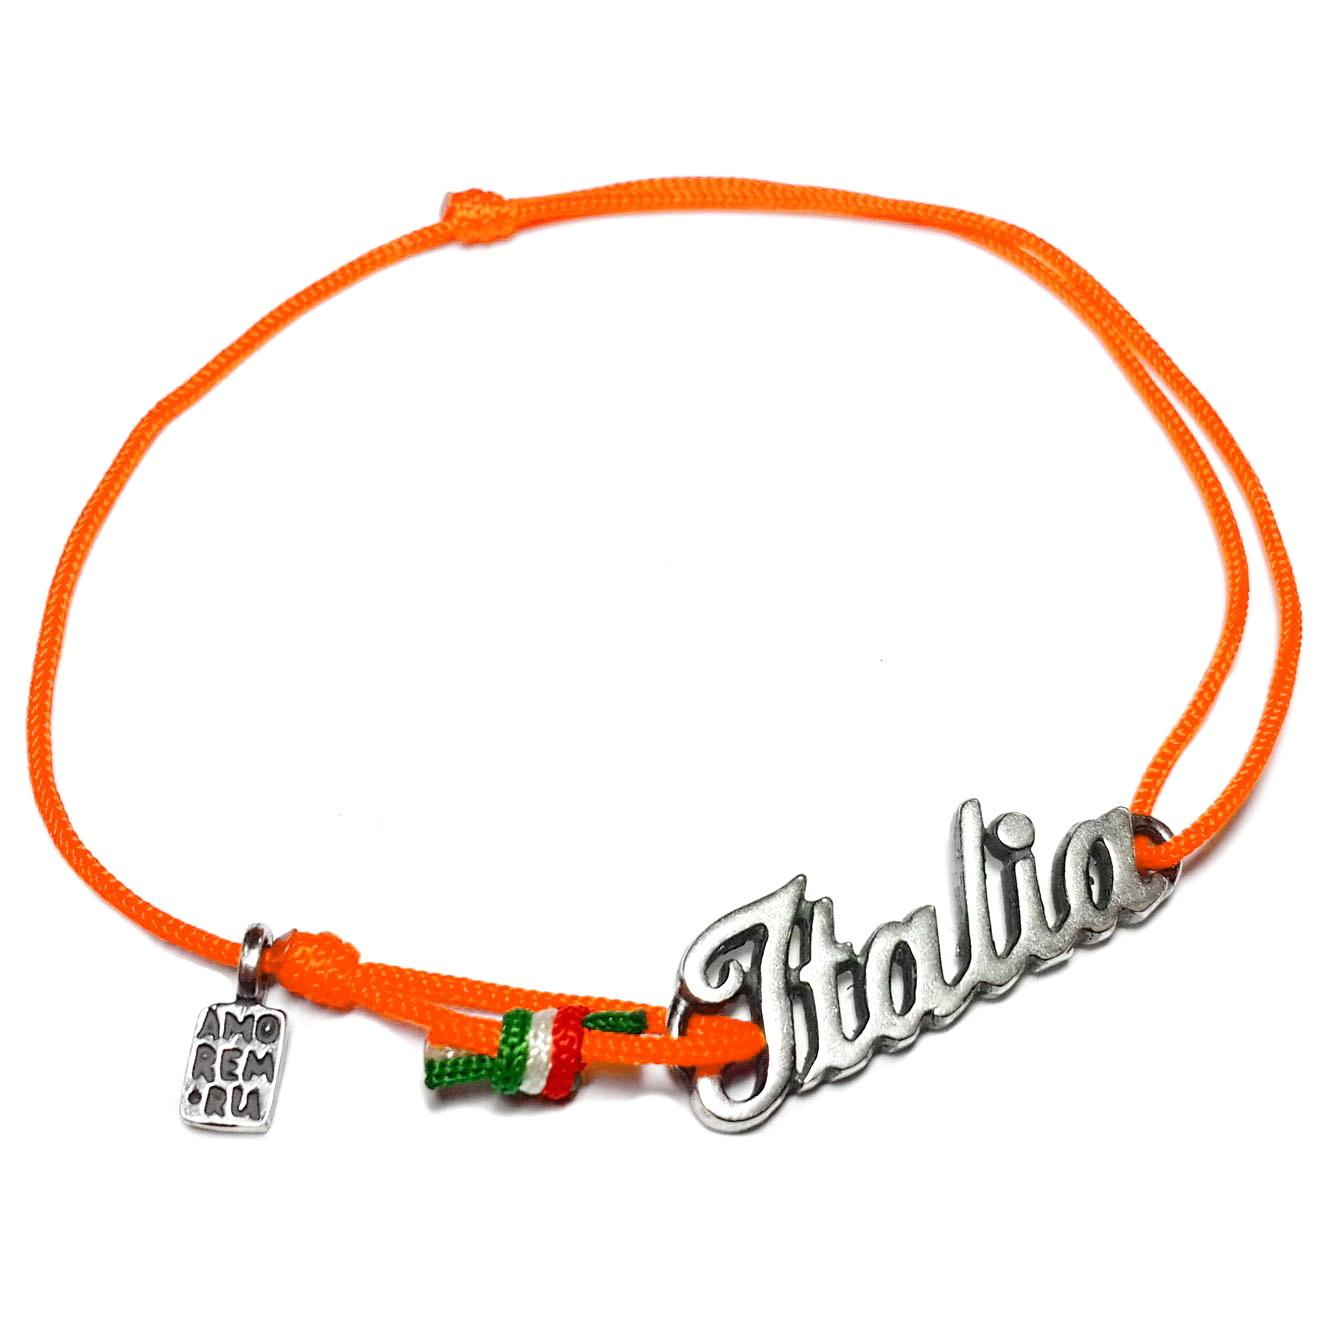 Italy Bracelet, sterling silver charm